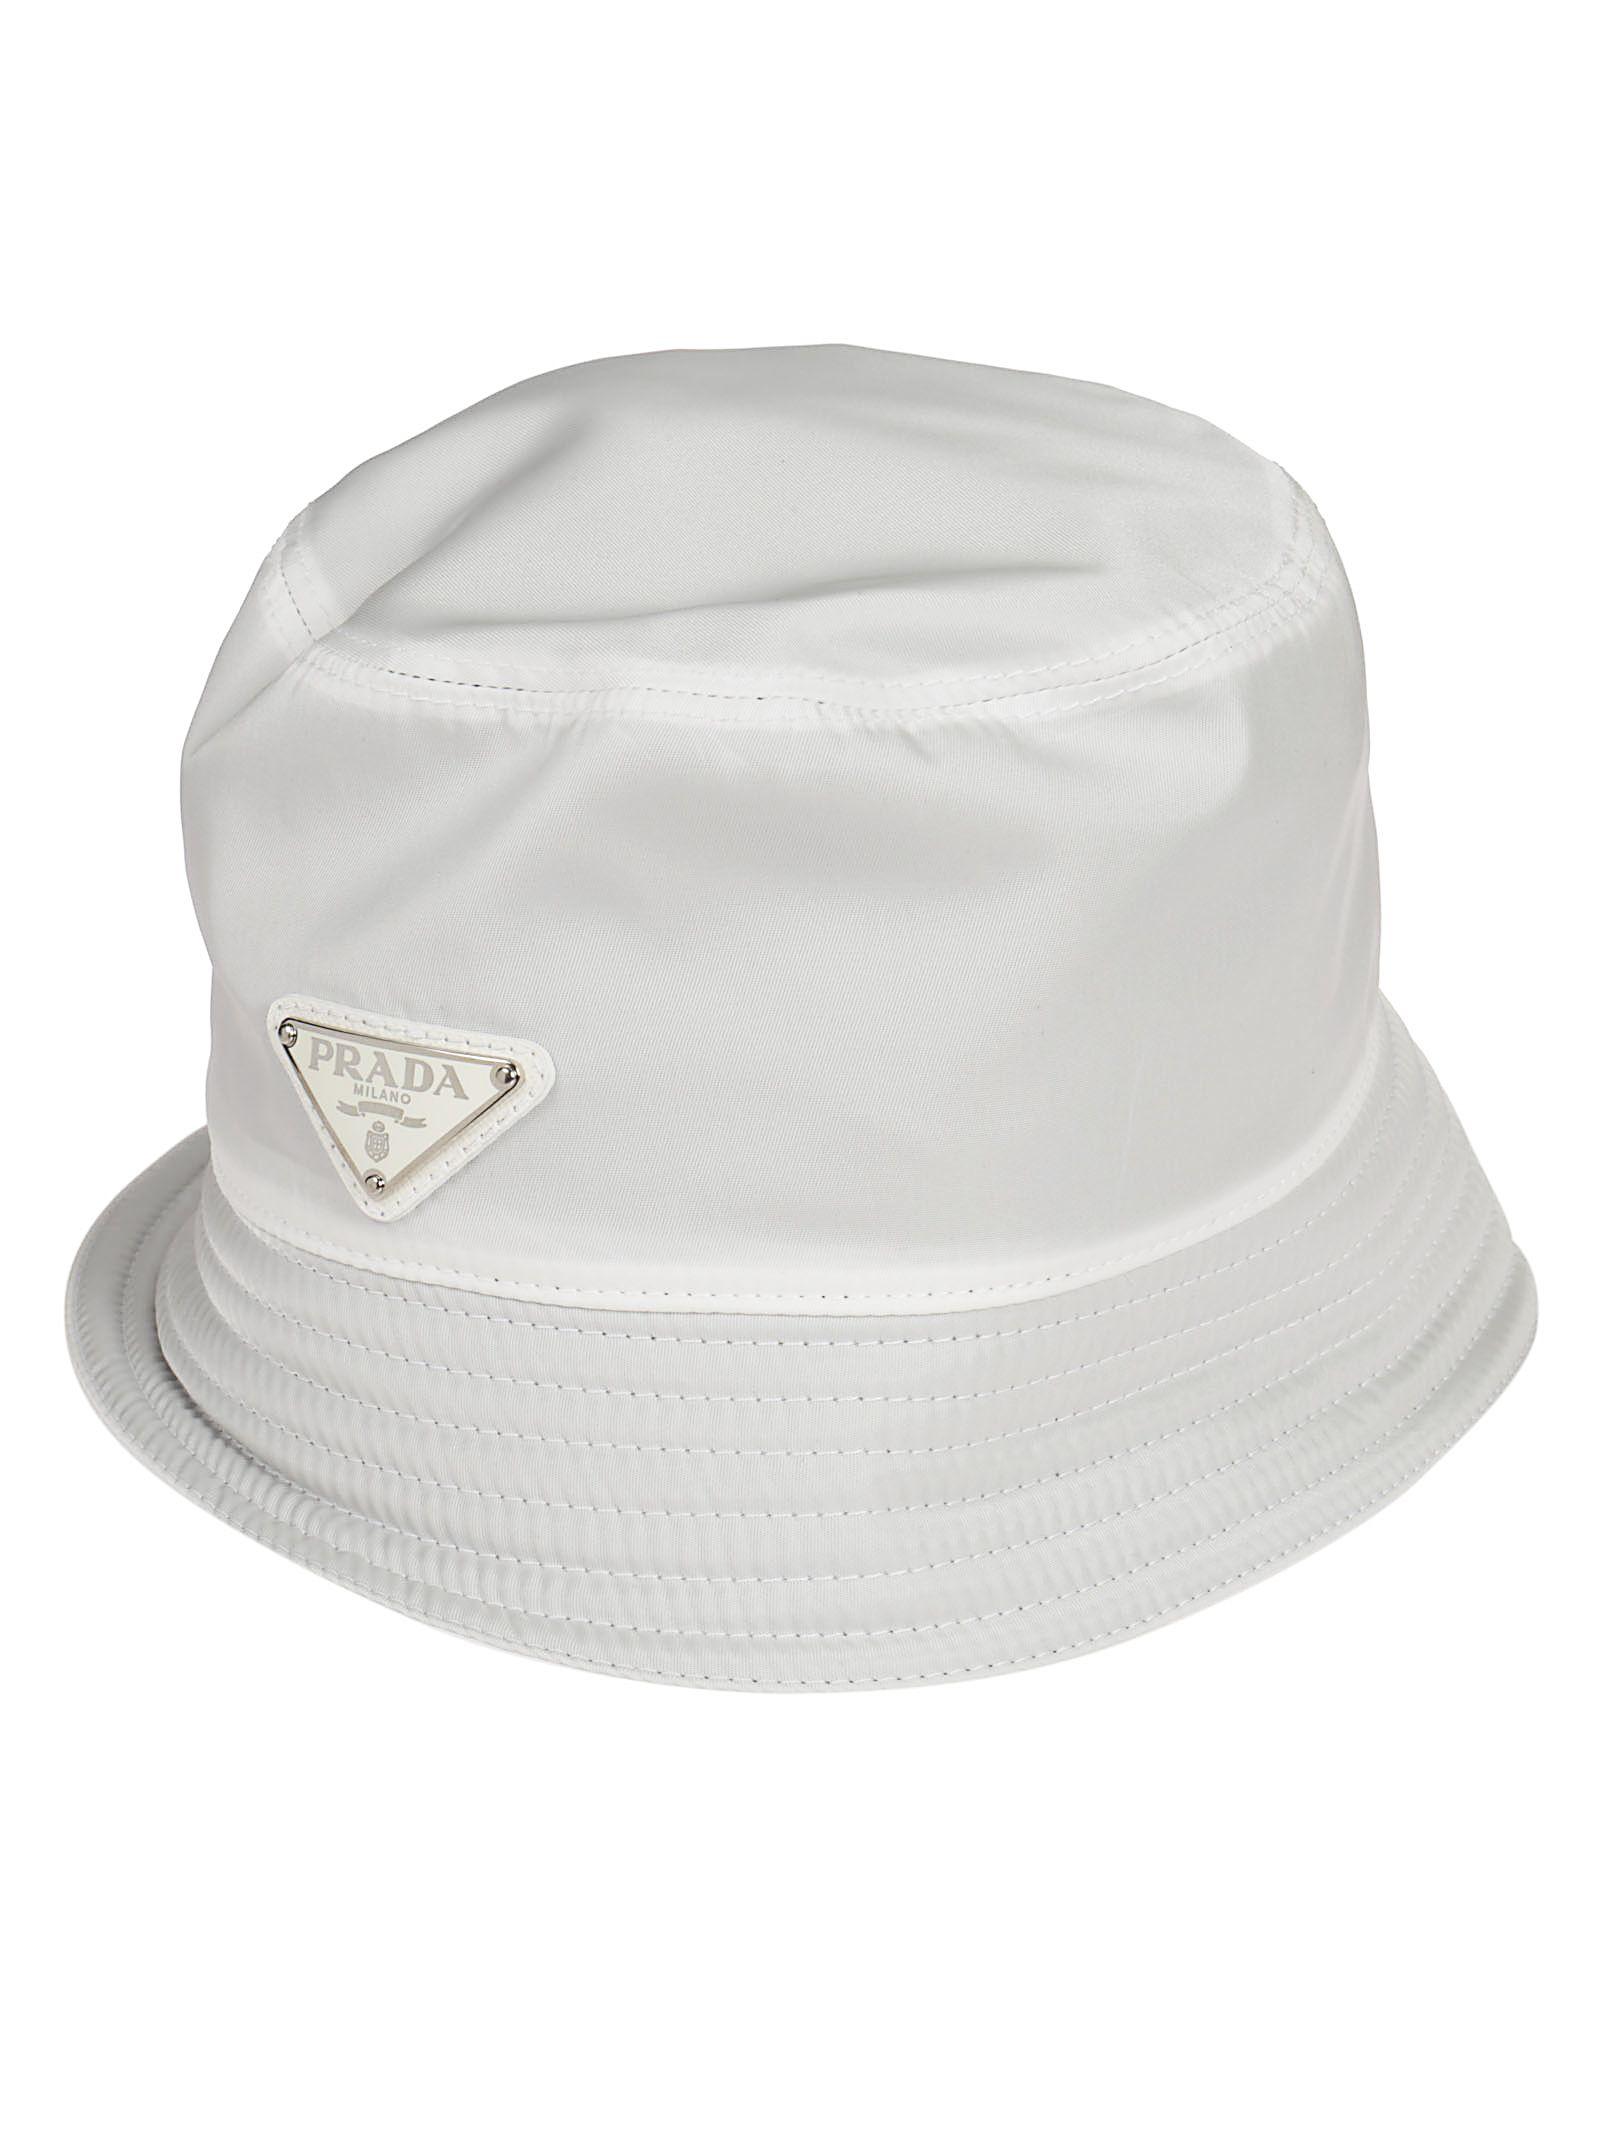 3dceeb1b710 PRADA LOGO PLAQUE RAIN HAT